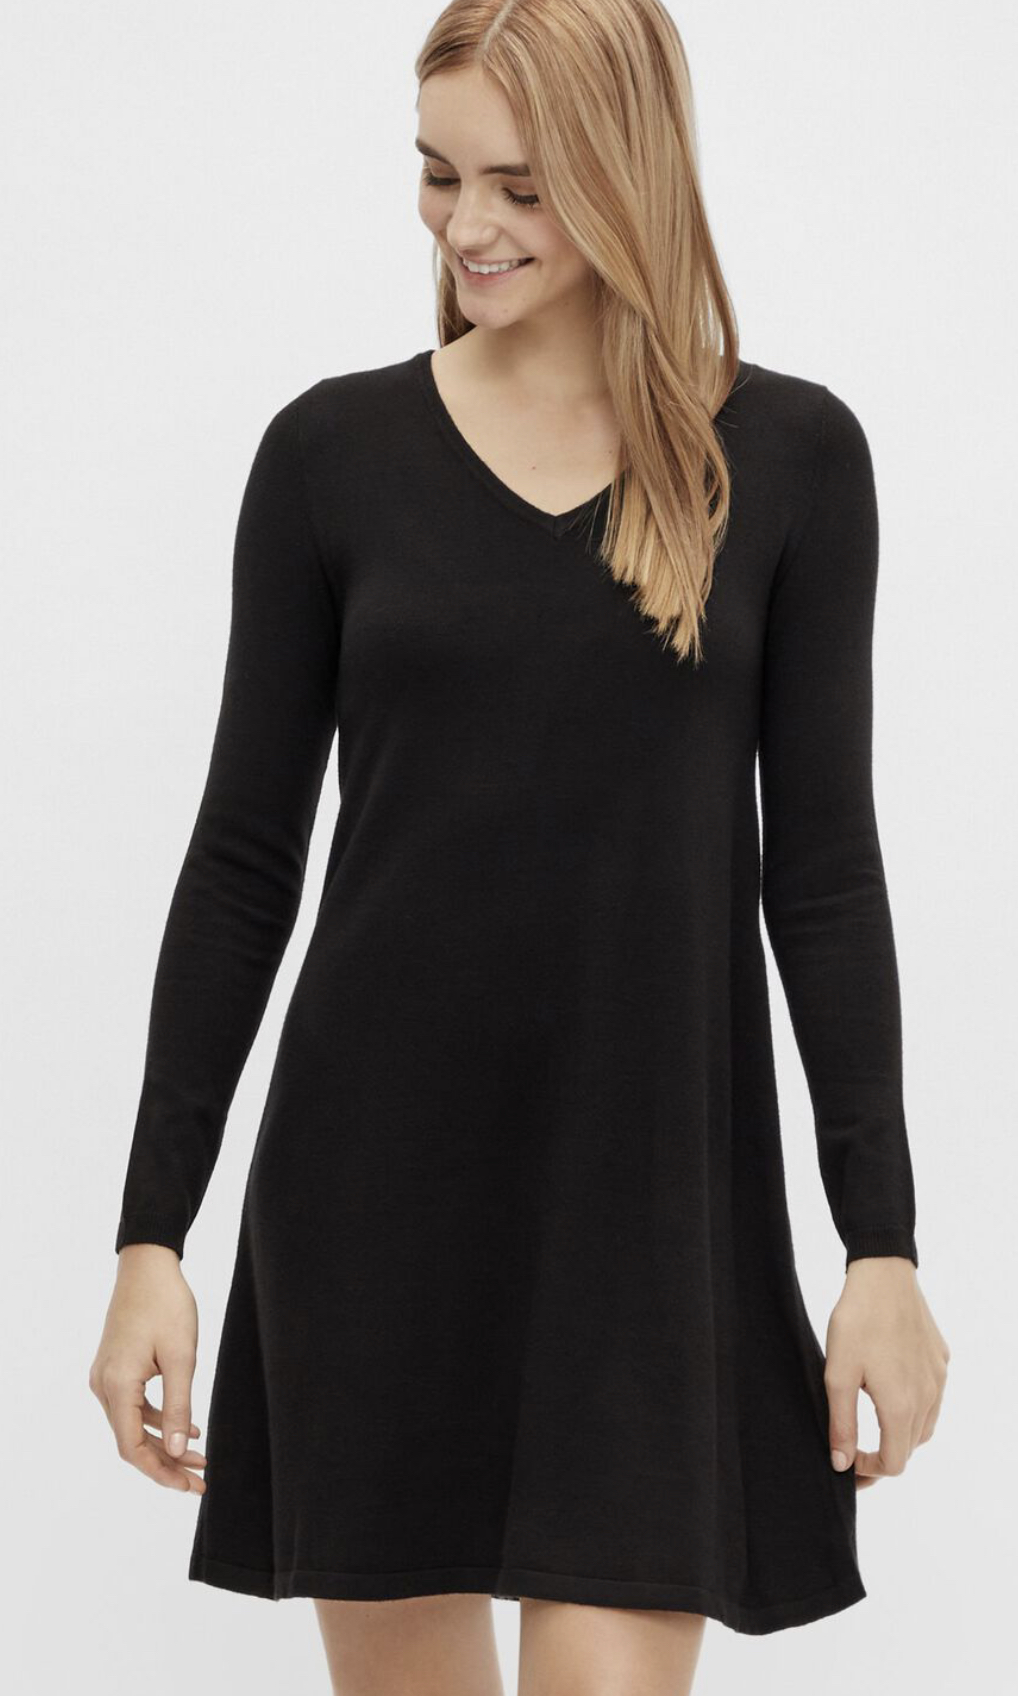 PCCENIA V-Neck Knit Dress Brown